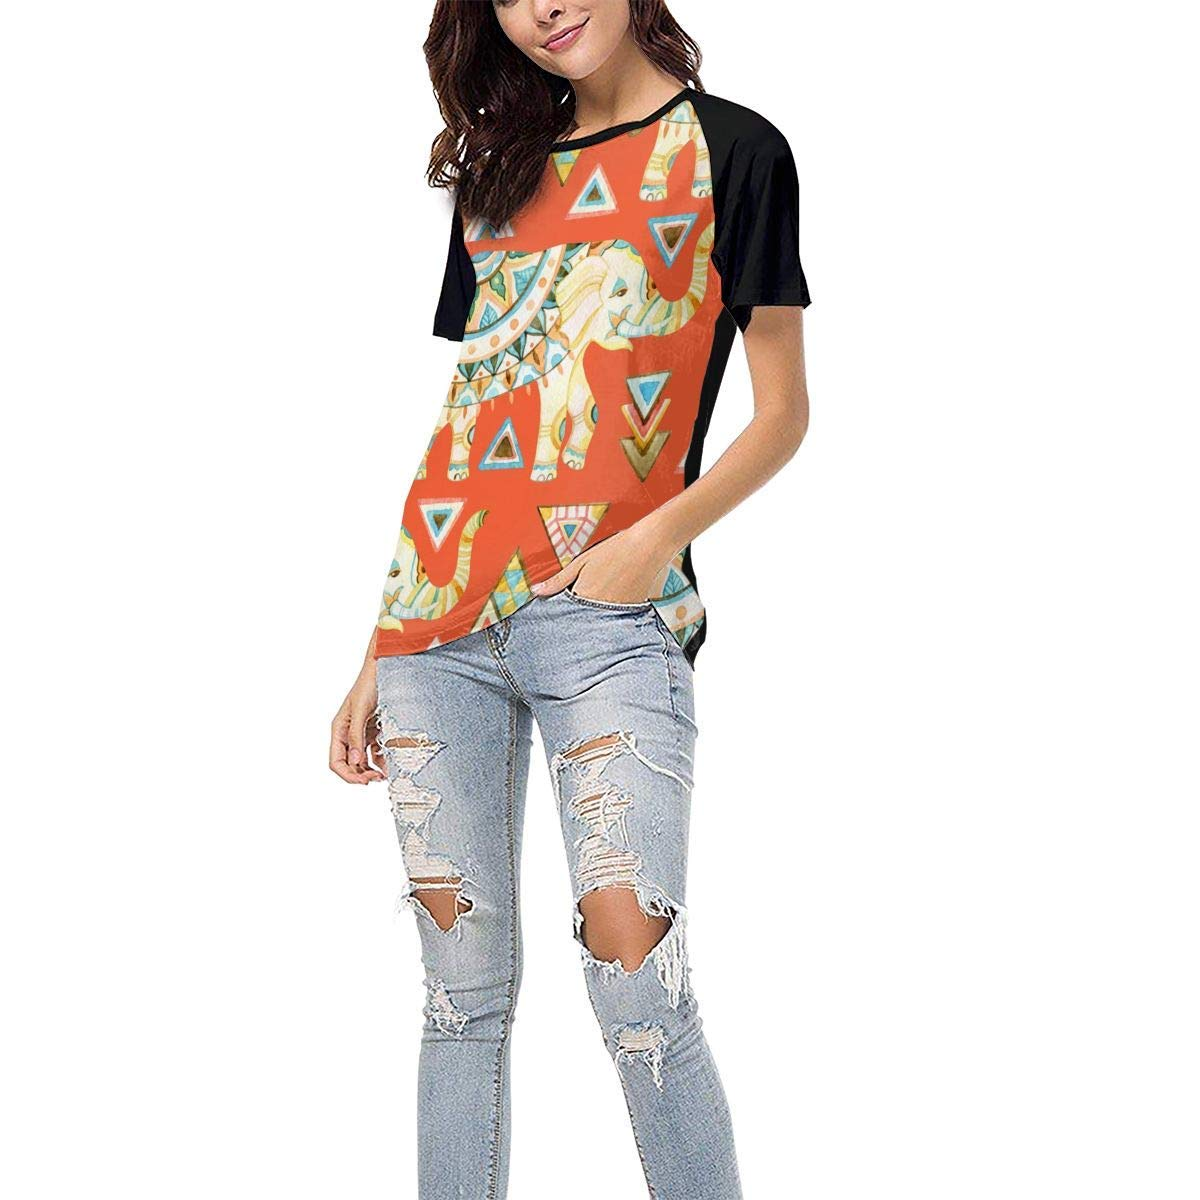 Womens Jersey Shirt Baseball Tee Indian Ornate Elephant Stylish Crew Neck Short Sleeve Raglan T-Shirts Tops Blouse